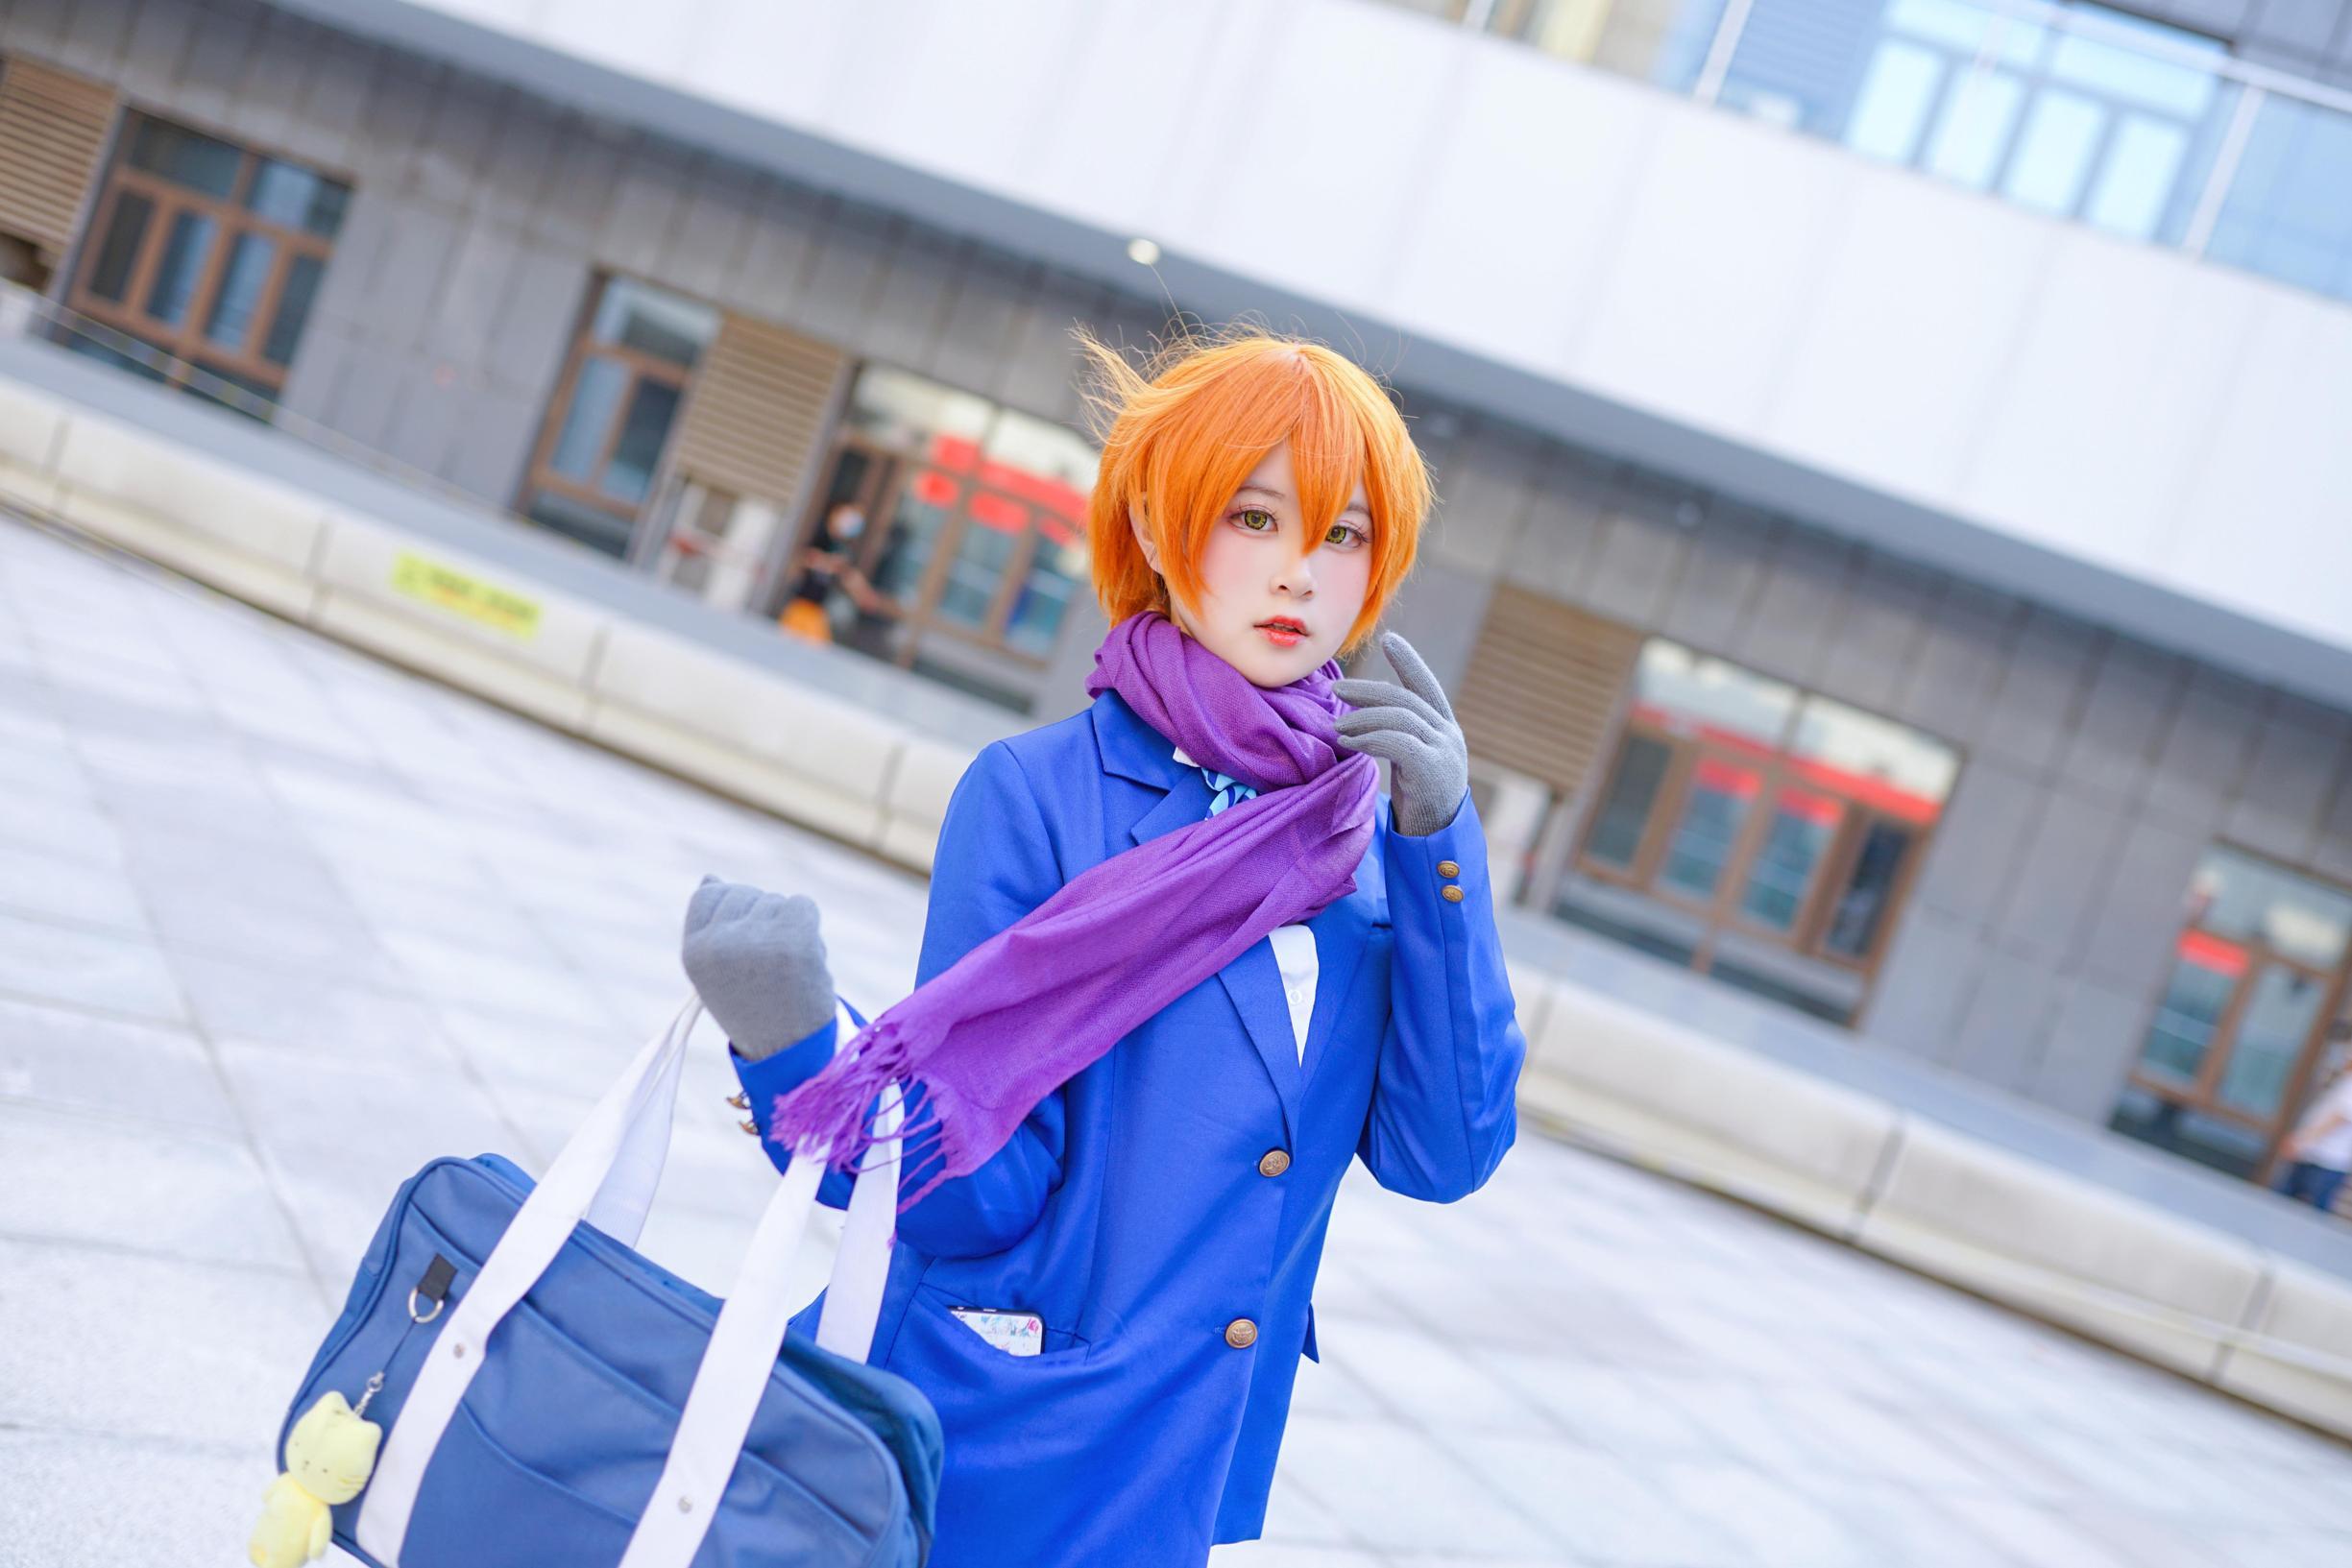 《LOVE LIVE!》美少女cosplay【CN:_李笑颜Lee】-第12张